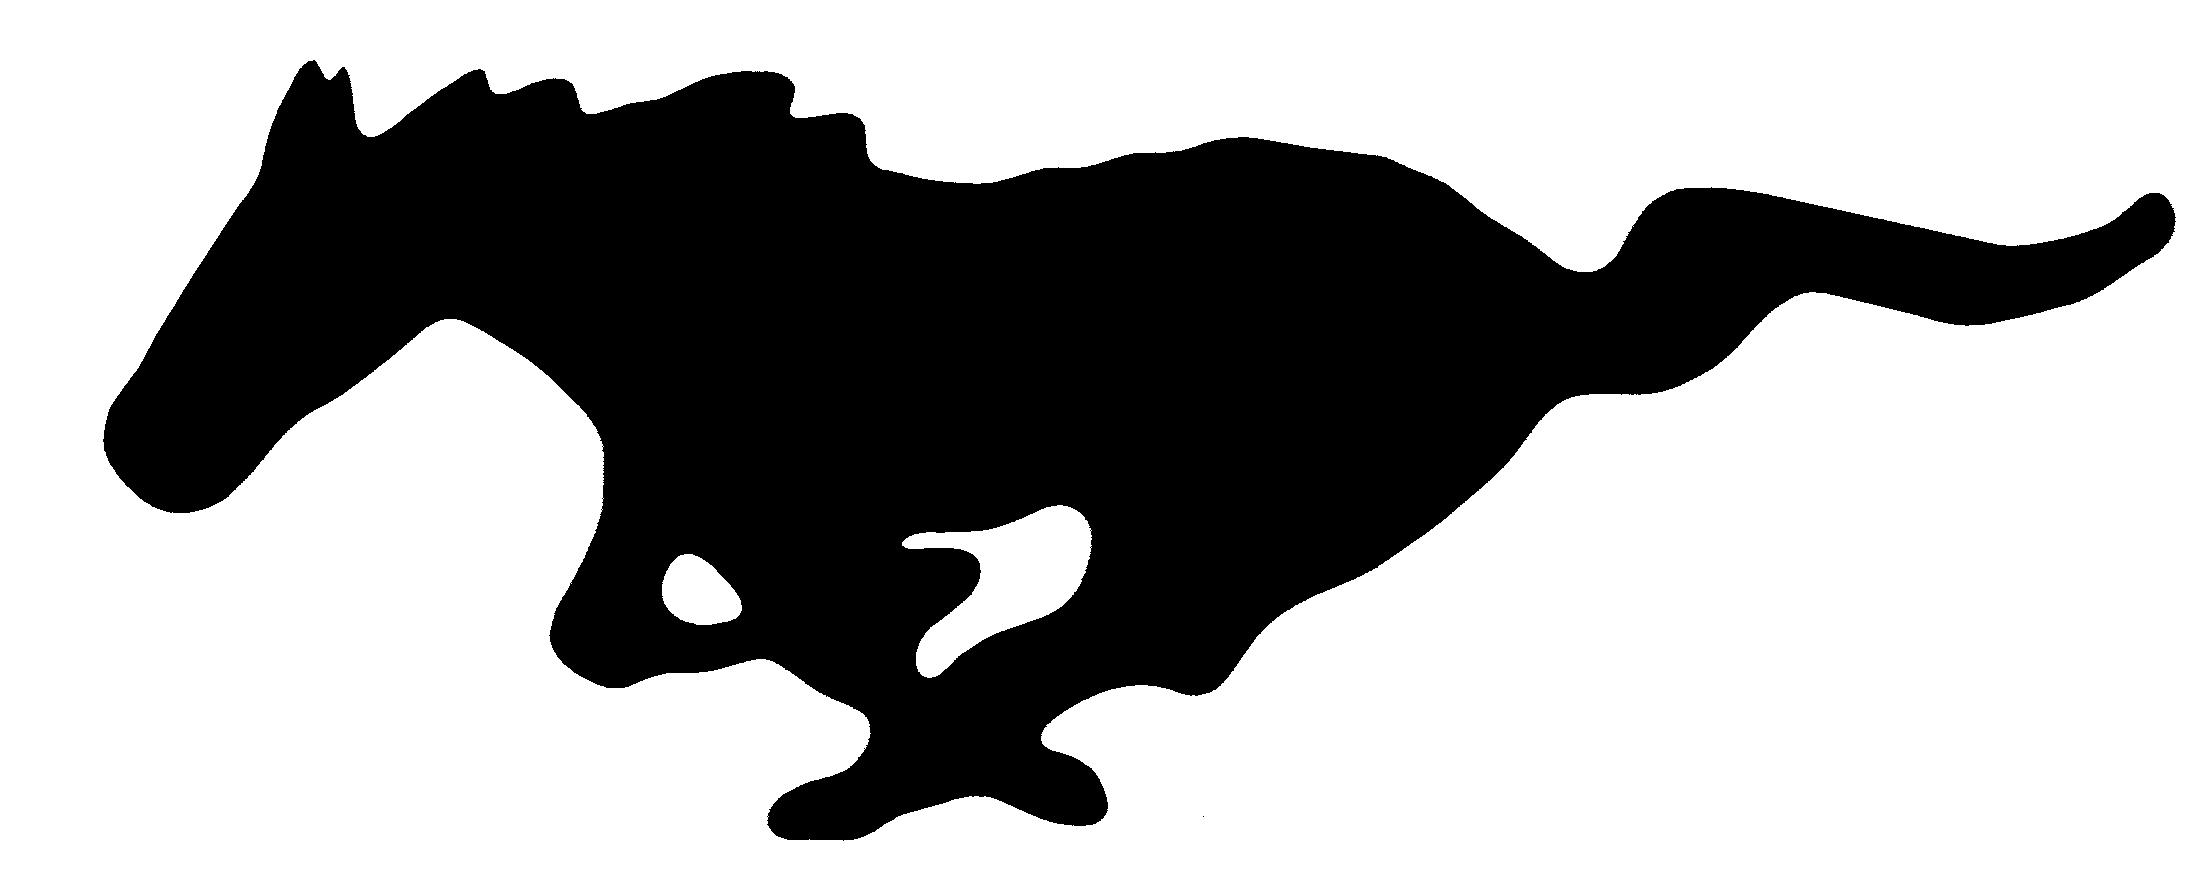 Mustang clipart mustang emblem. Png images transparent free